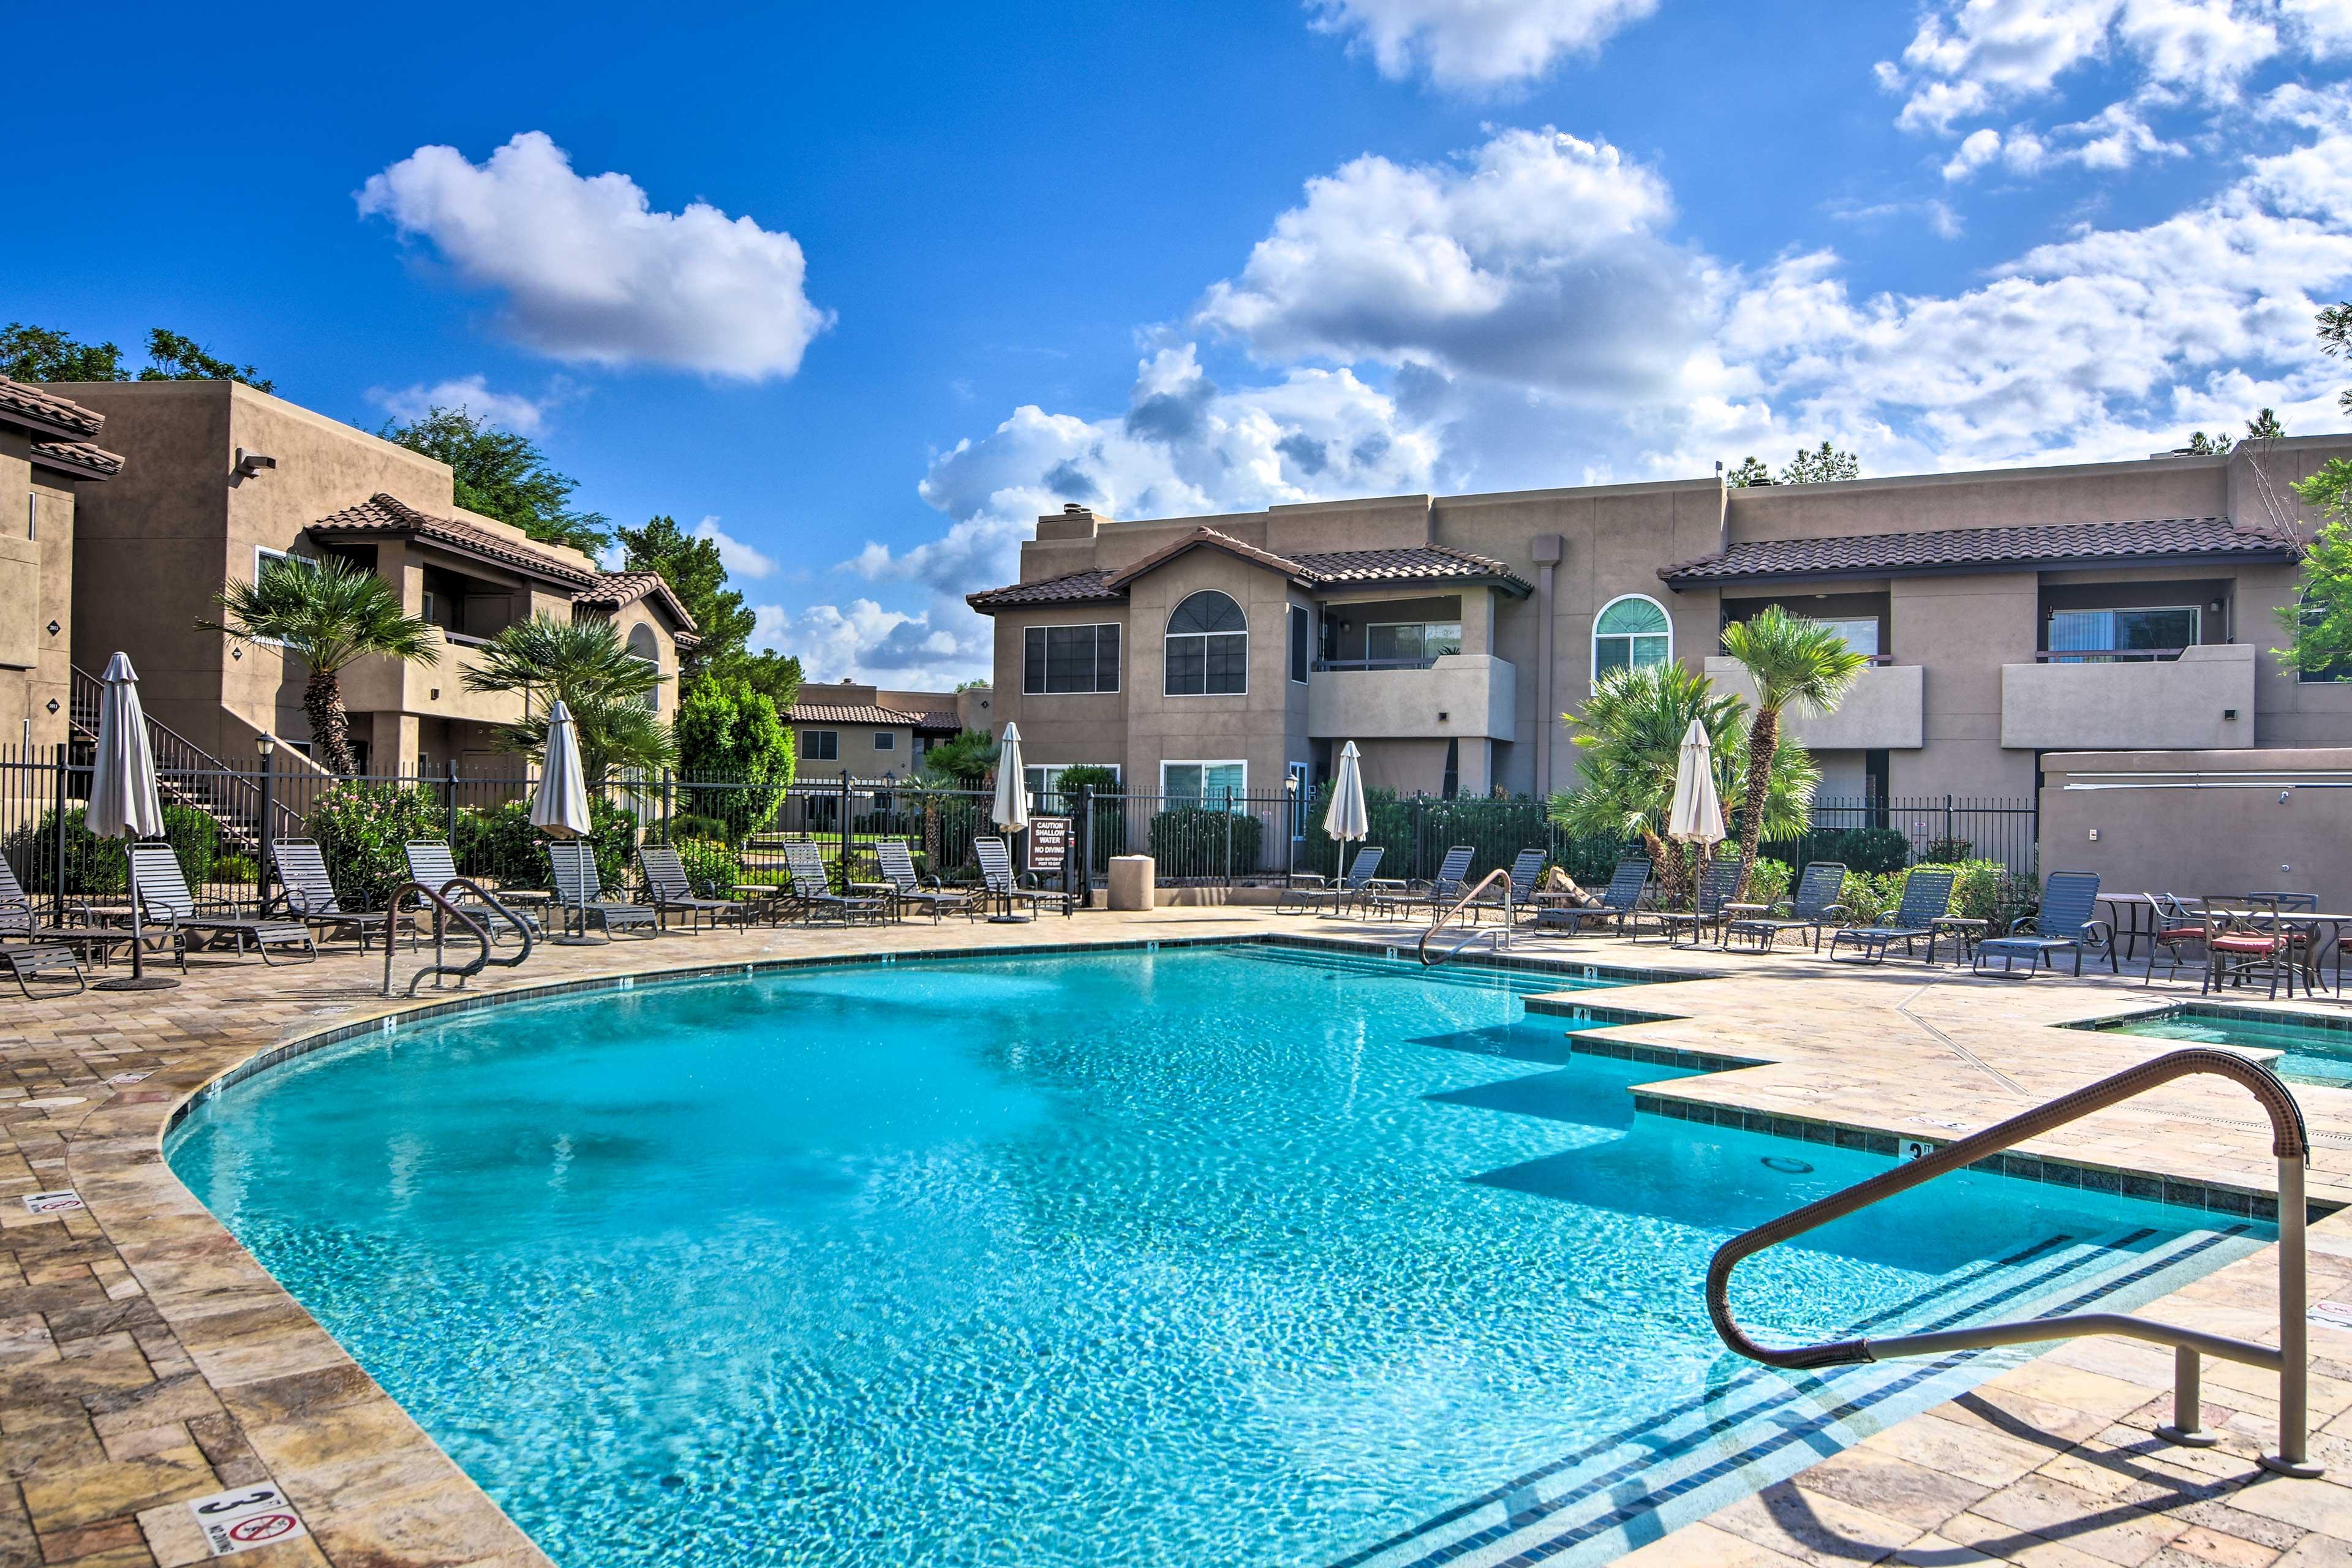 This vacation rental condo is located at Aventura Condominiums.